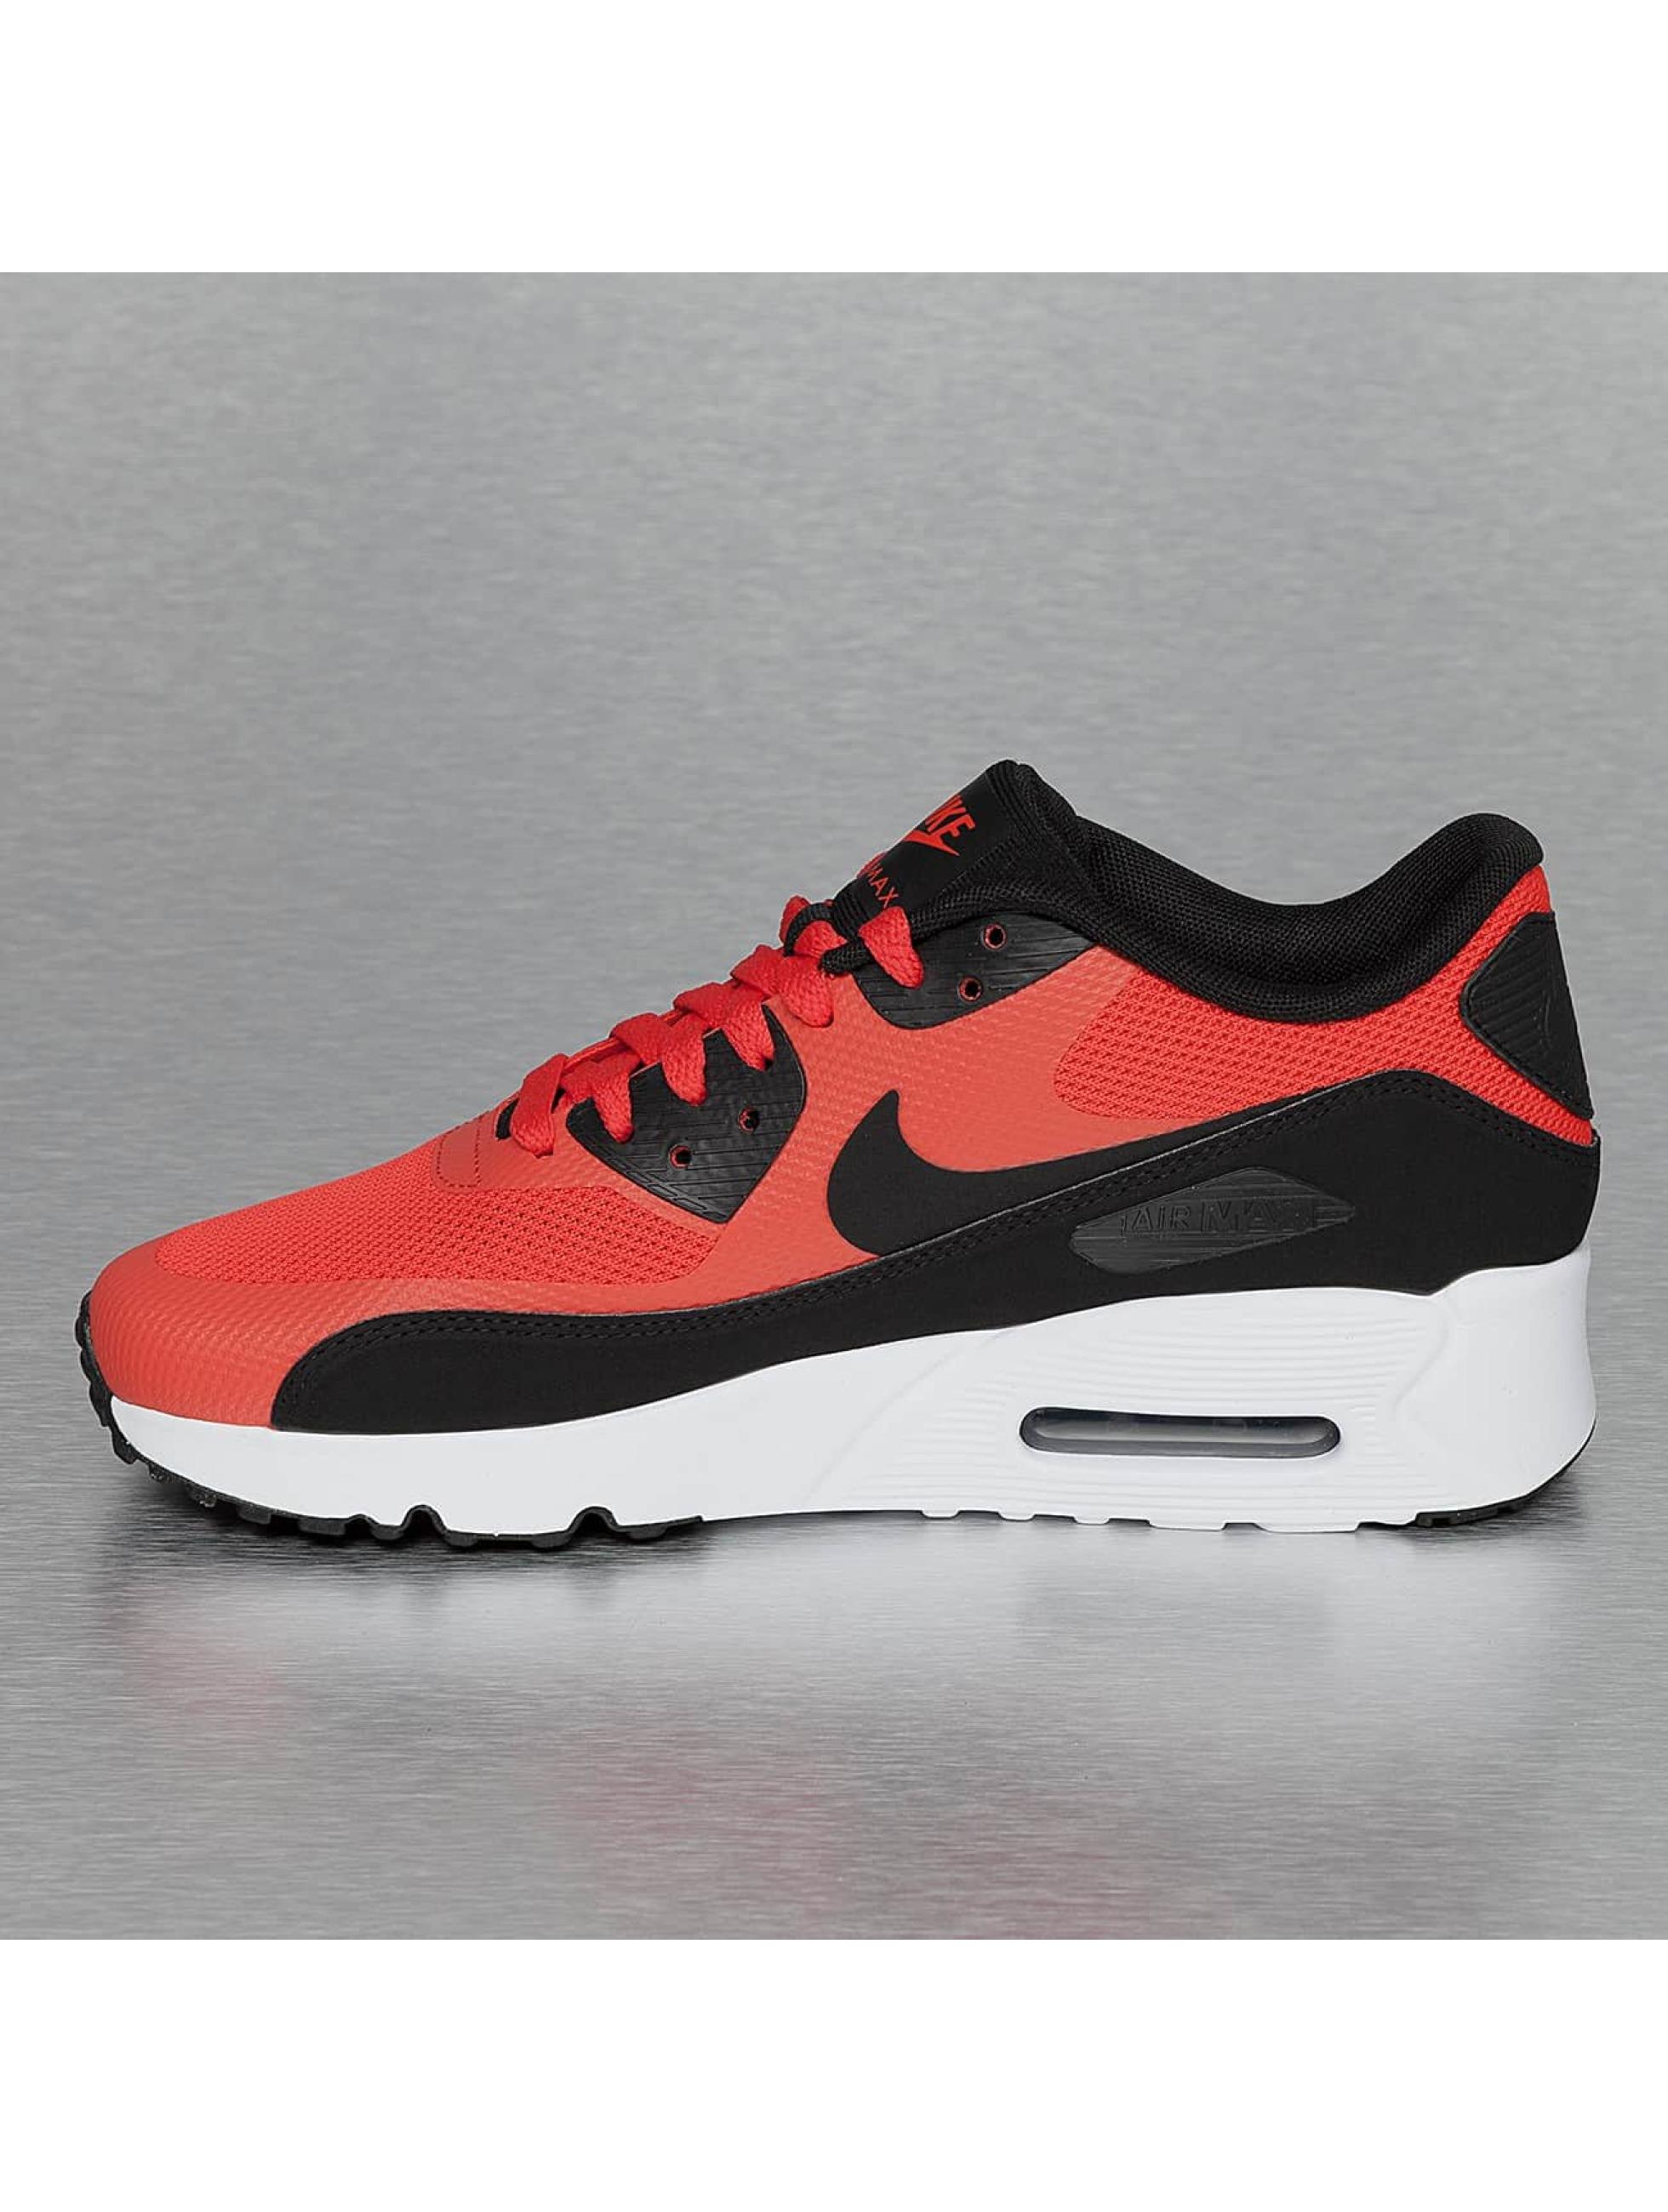 Nike Zapatillas de deporte Air Max 90 Ultra 2.0 naranja